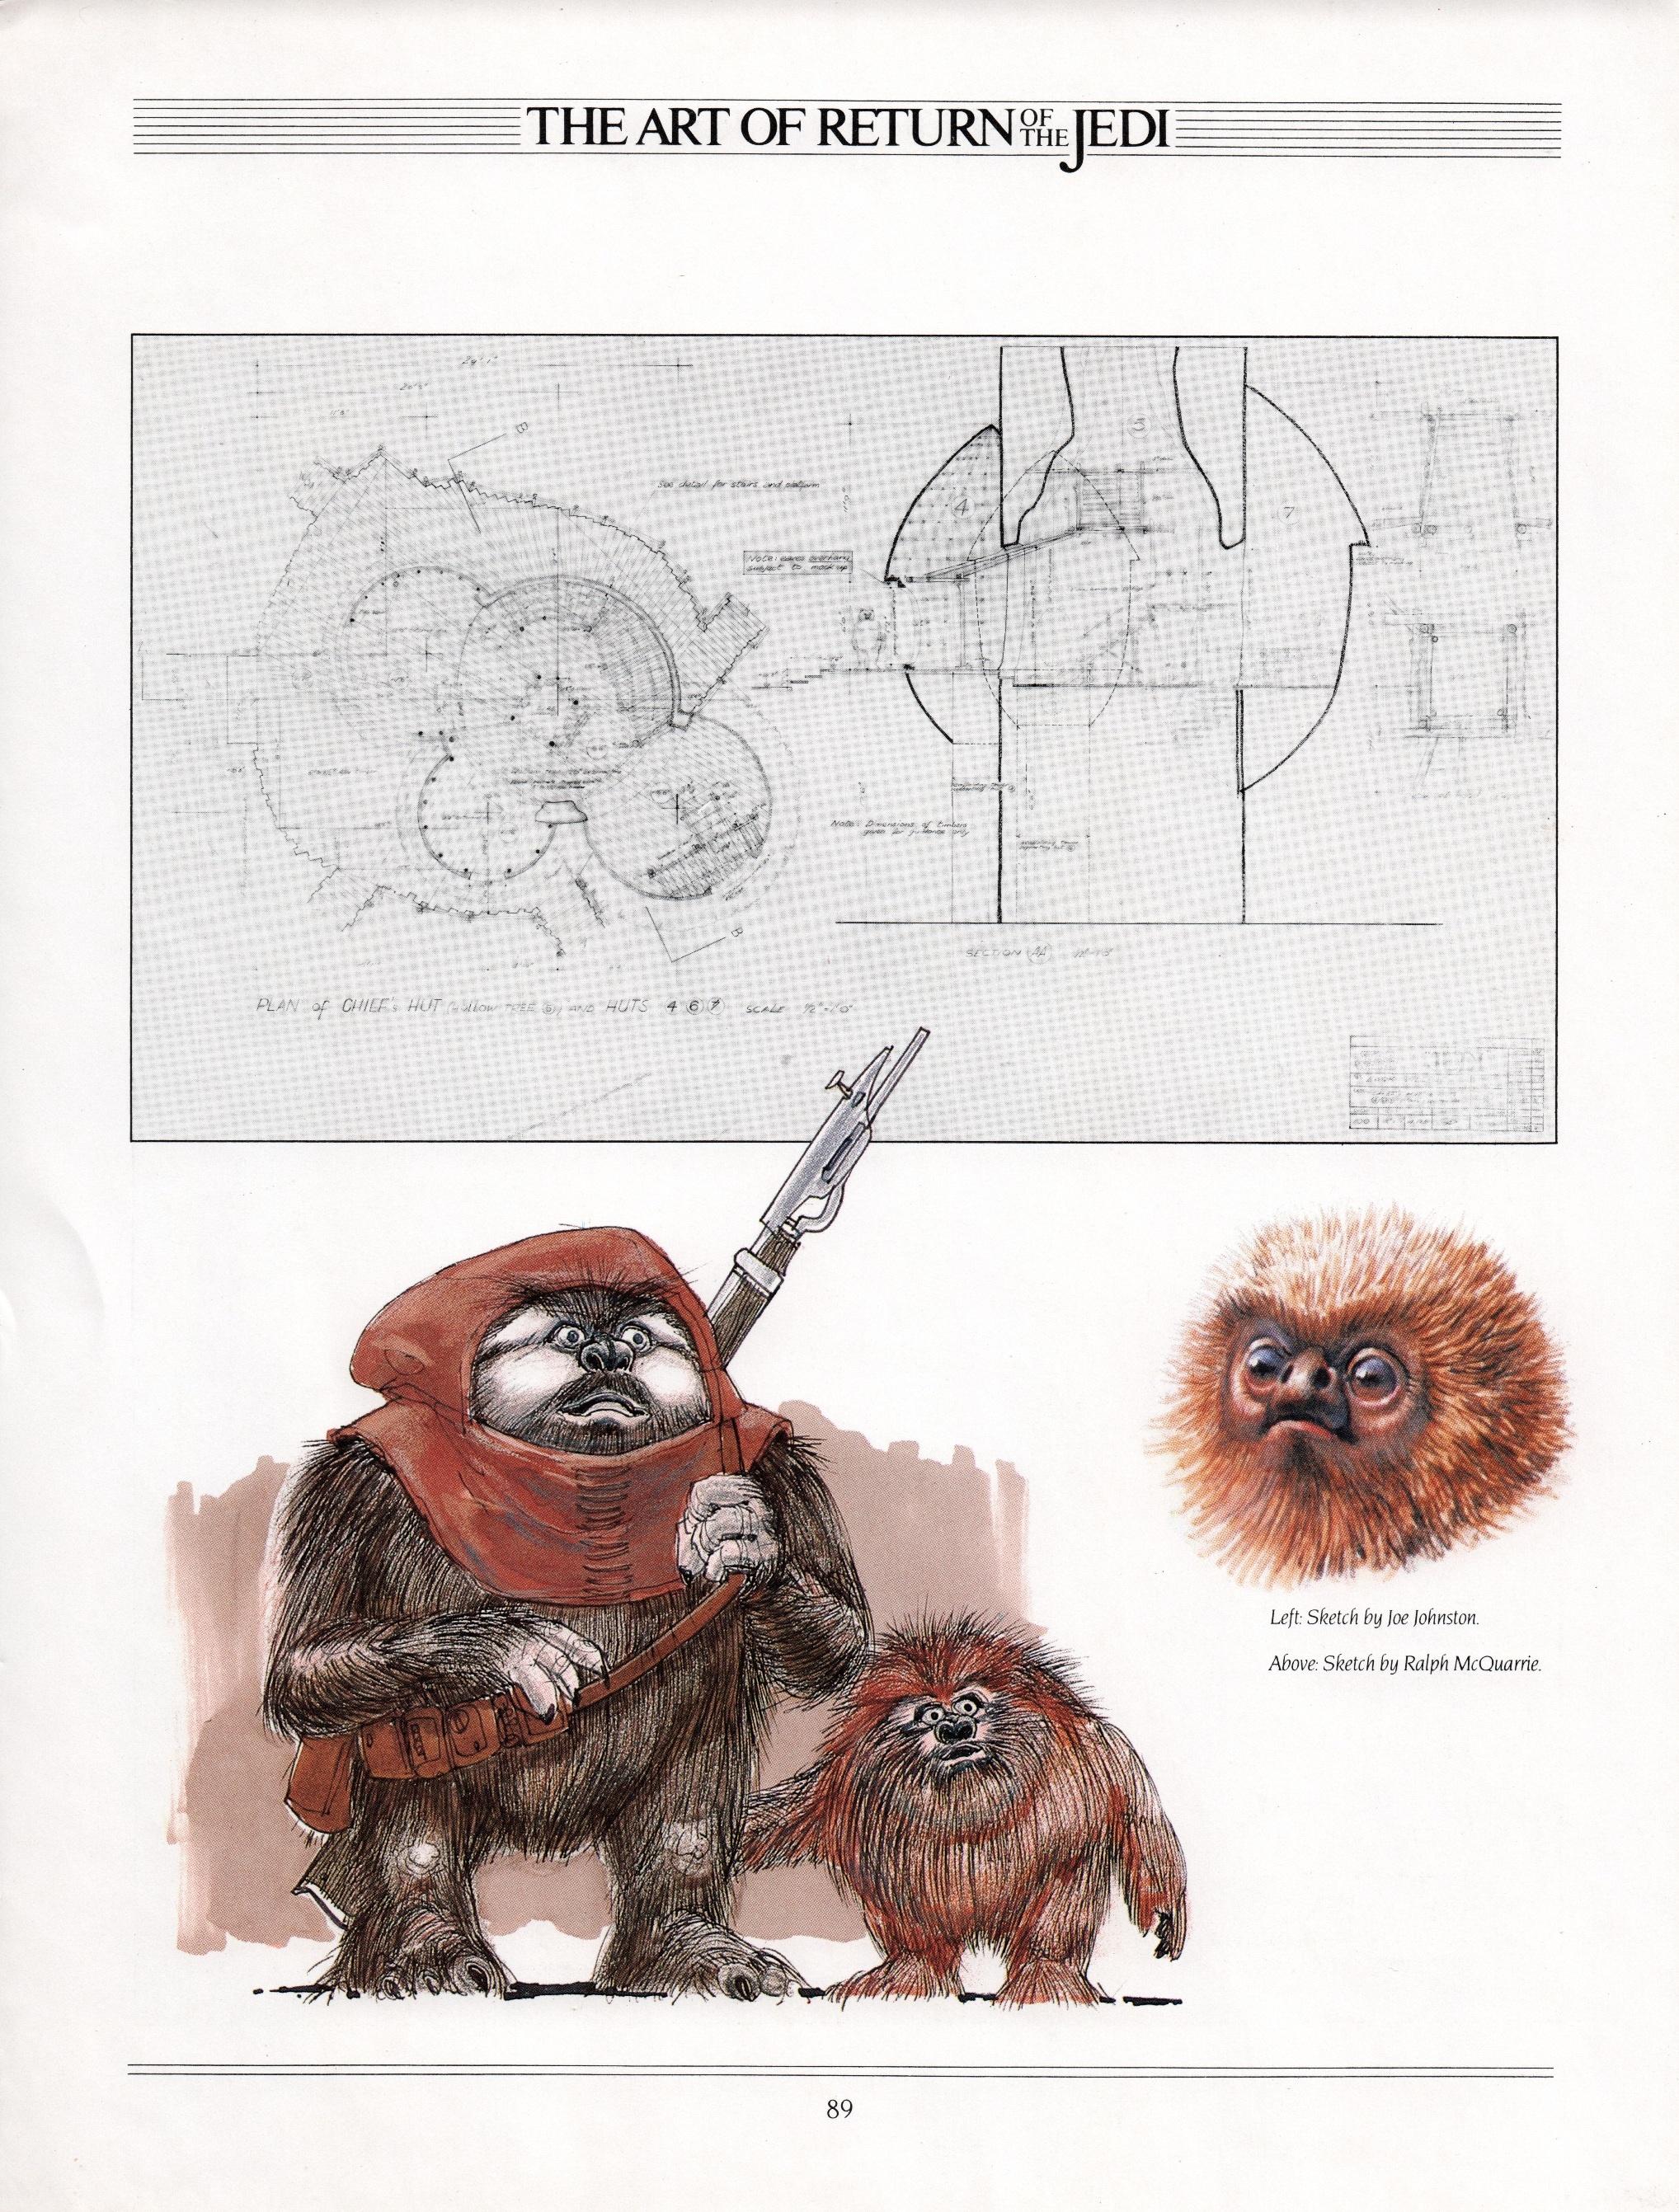 Art of Return of the Jedi (b0bafett_Empire)-p089